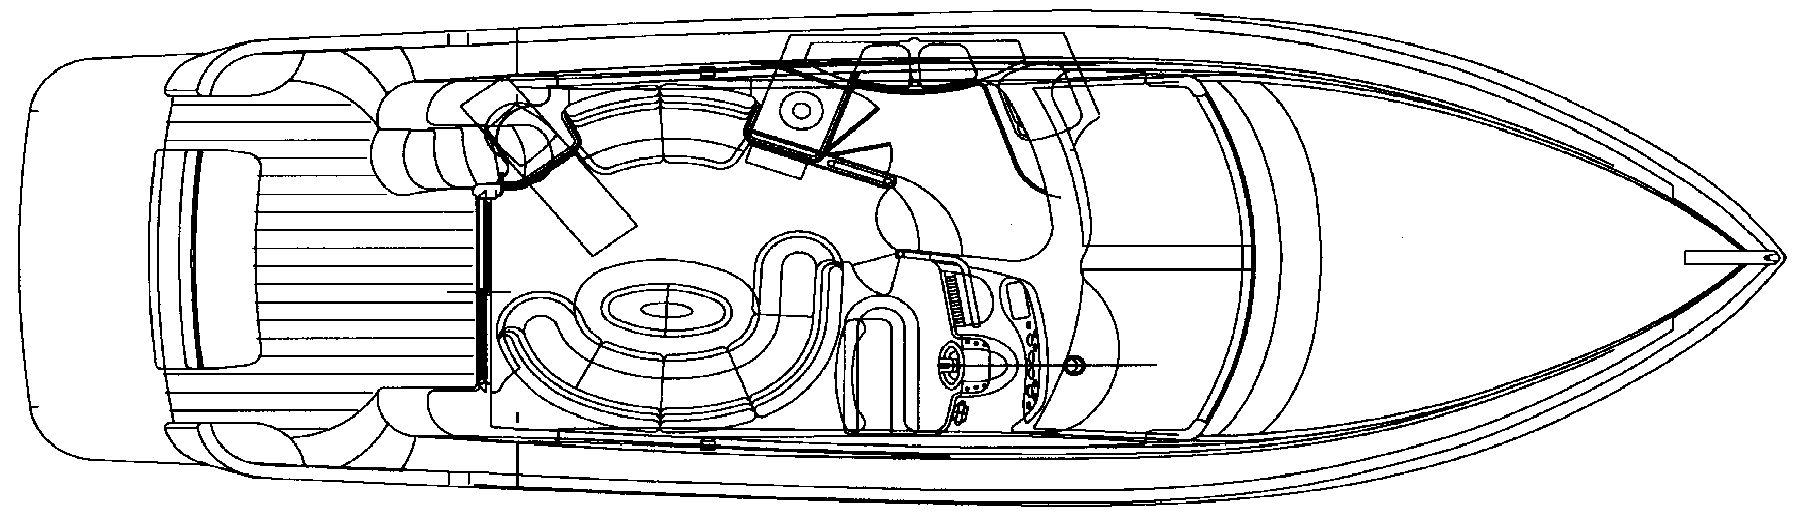 42 Flybridge Floor Plan 2